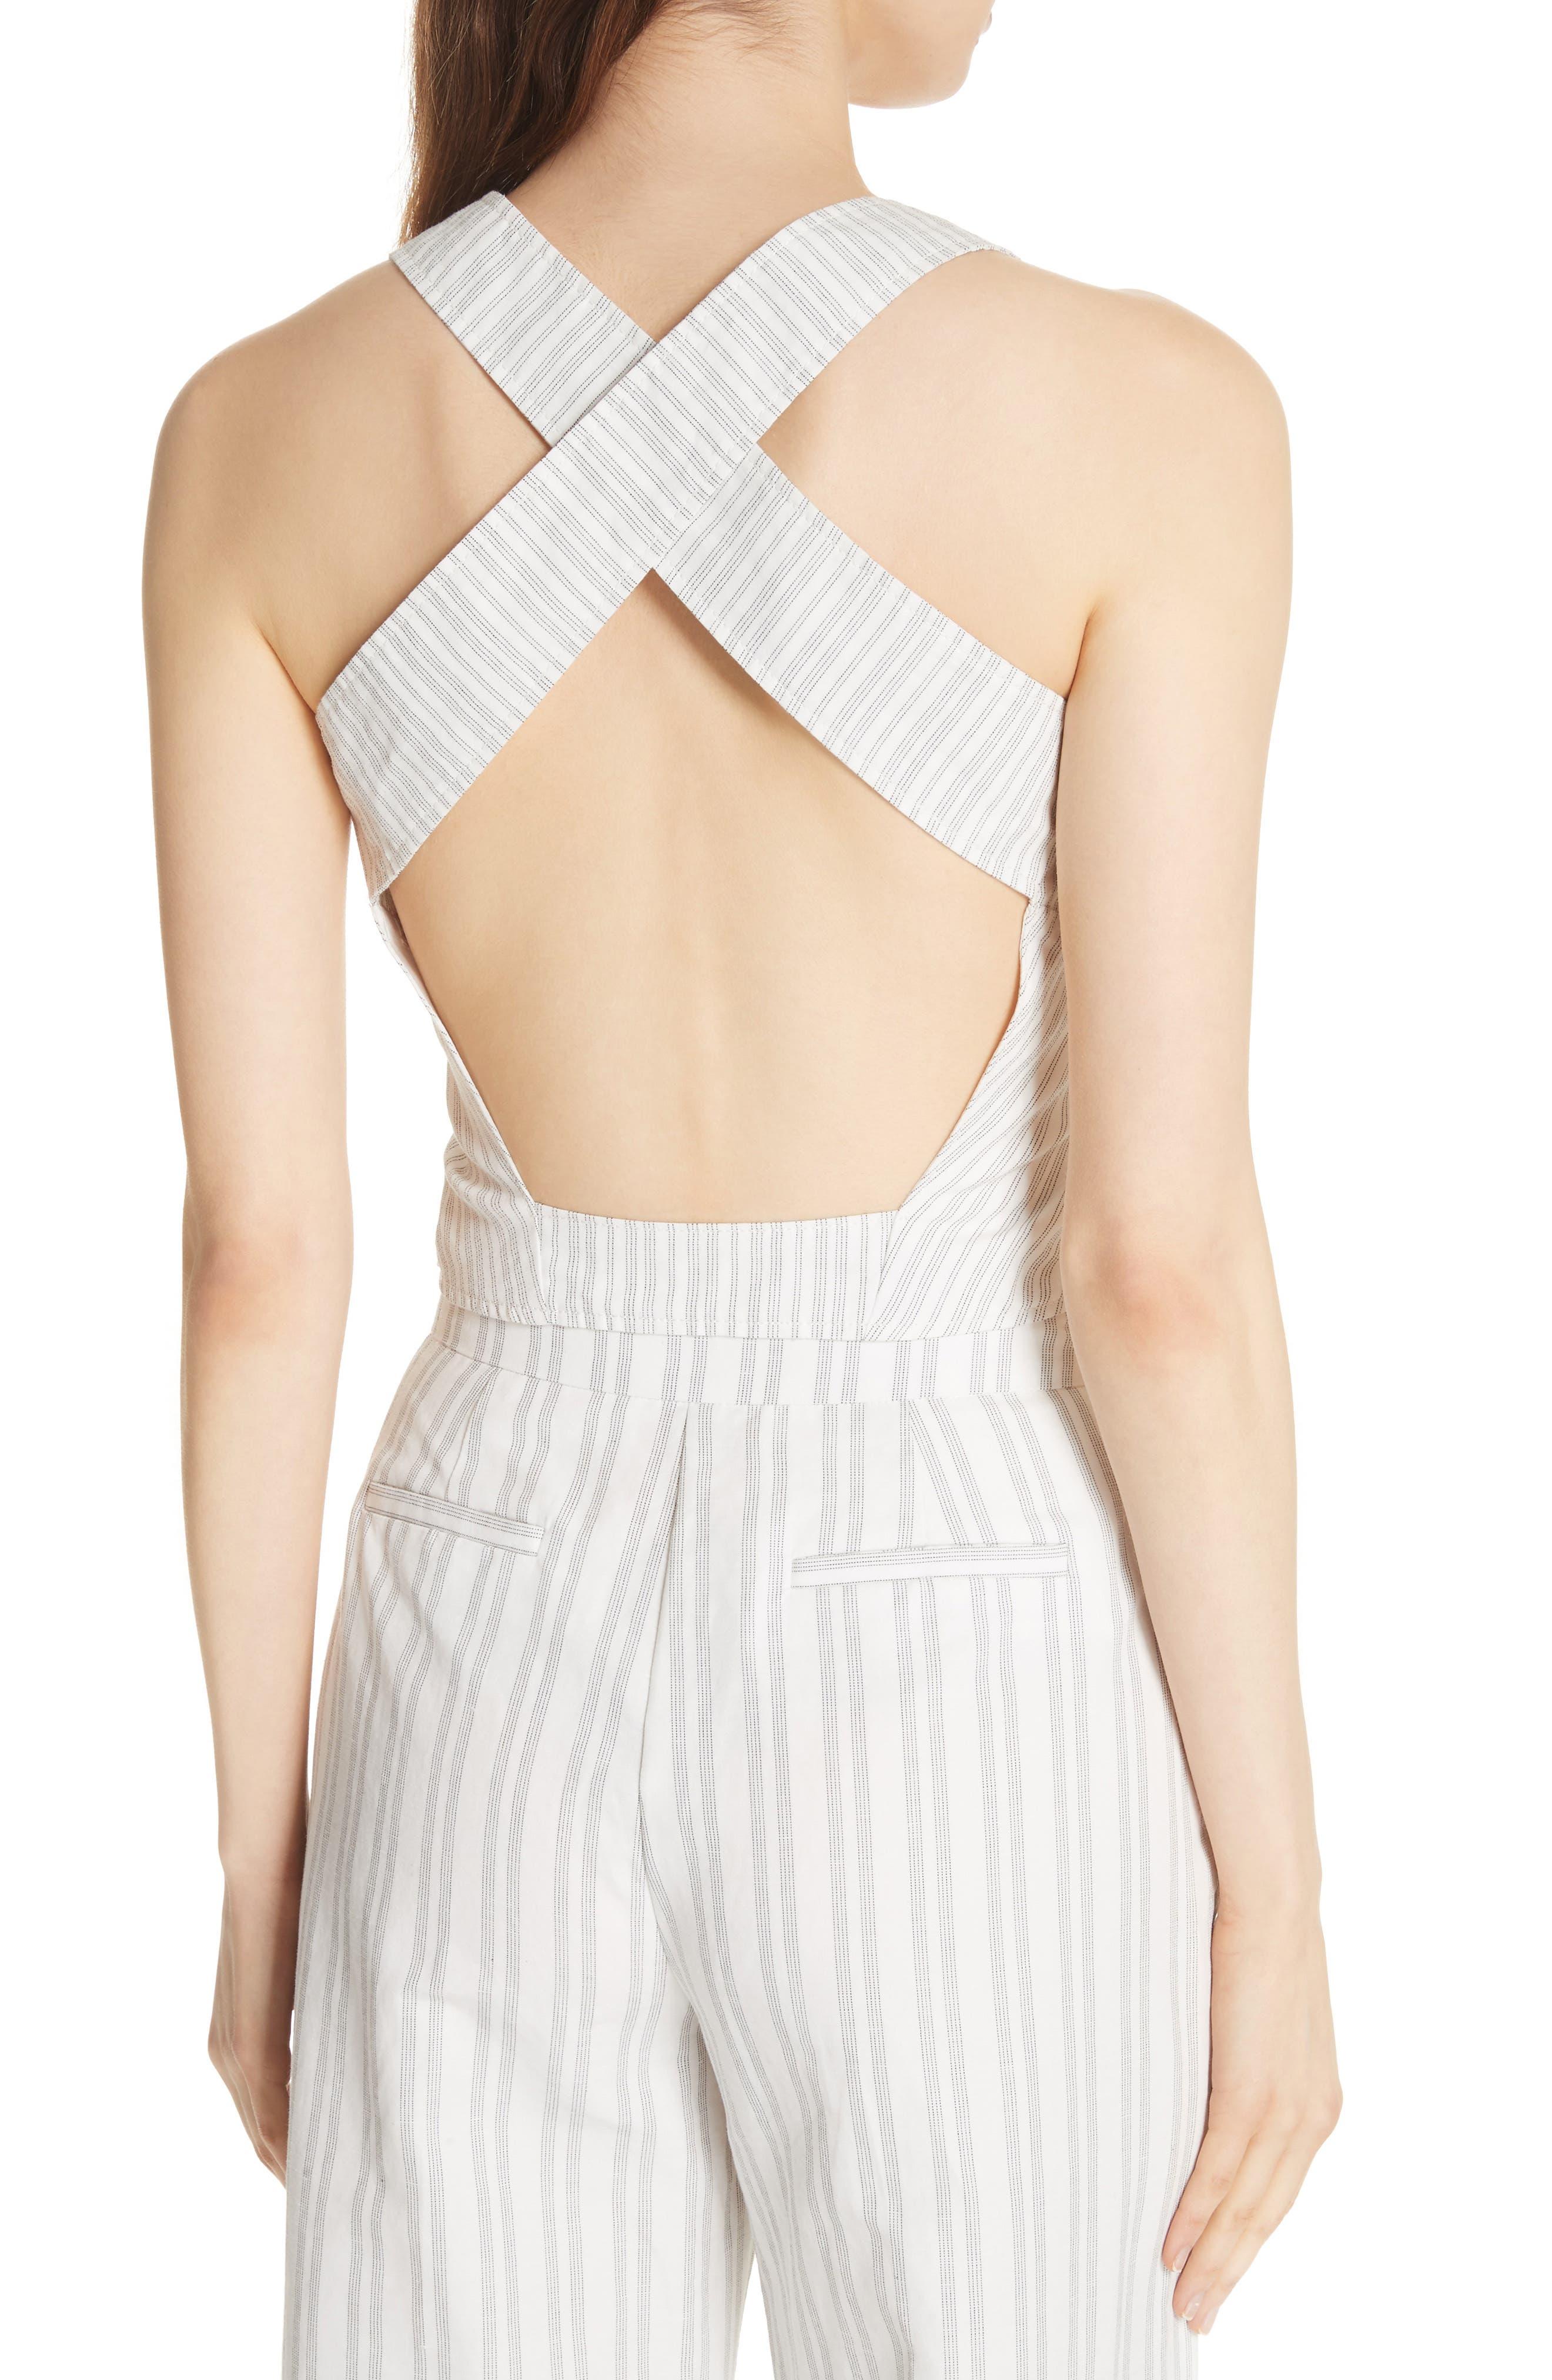 REBECCA TAYLOR,                             Crisscross Back Stripe Cotton Linen Top,                             Alternate thumbnail 2, color,                             199